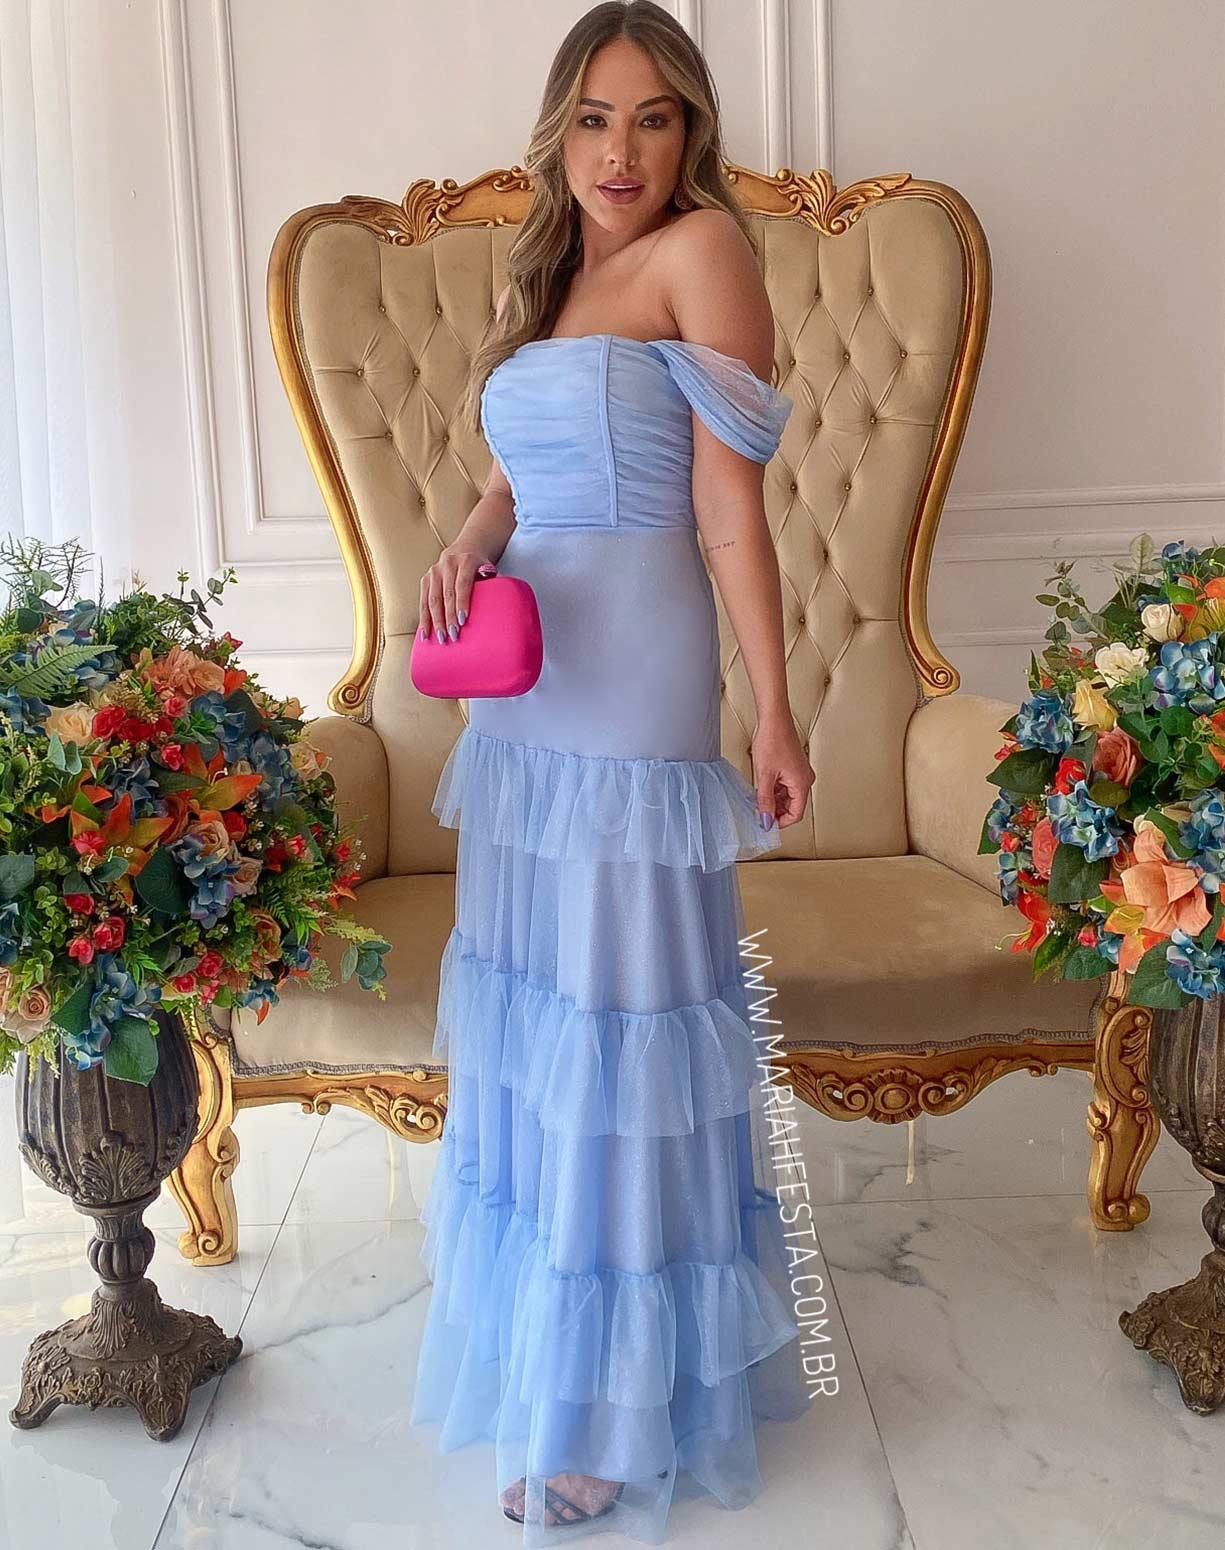 Vestido Azul Serenity em Tule Glitter com Corpete Drapeado